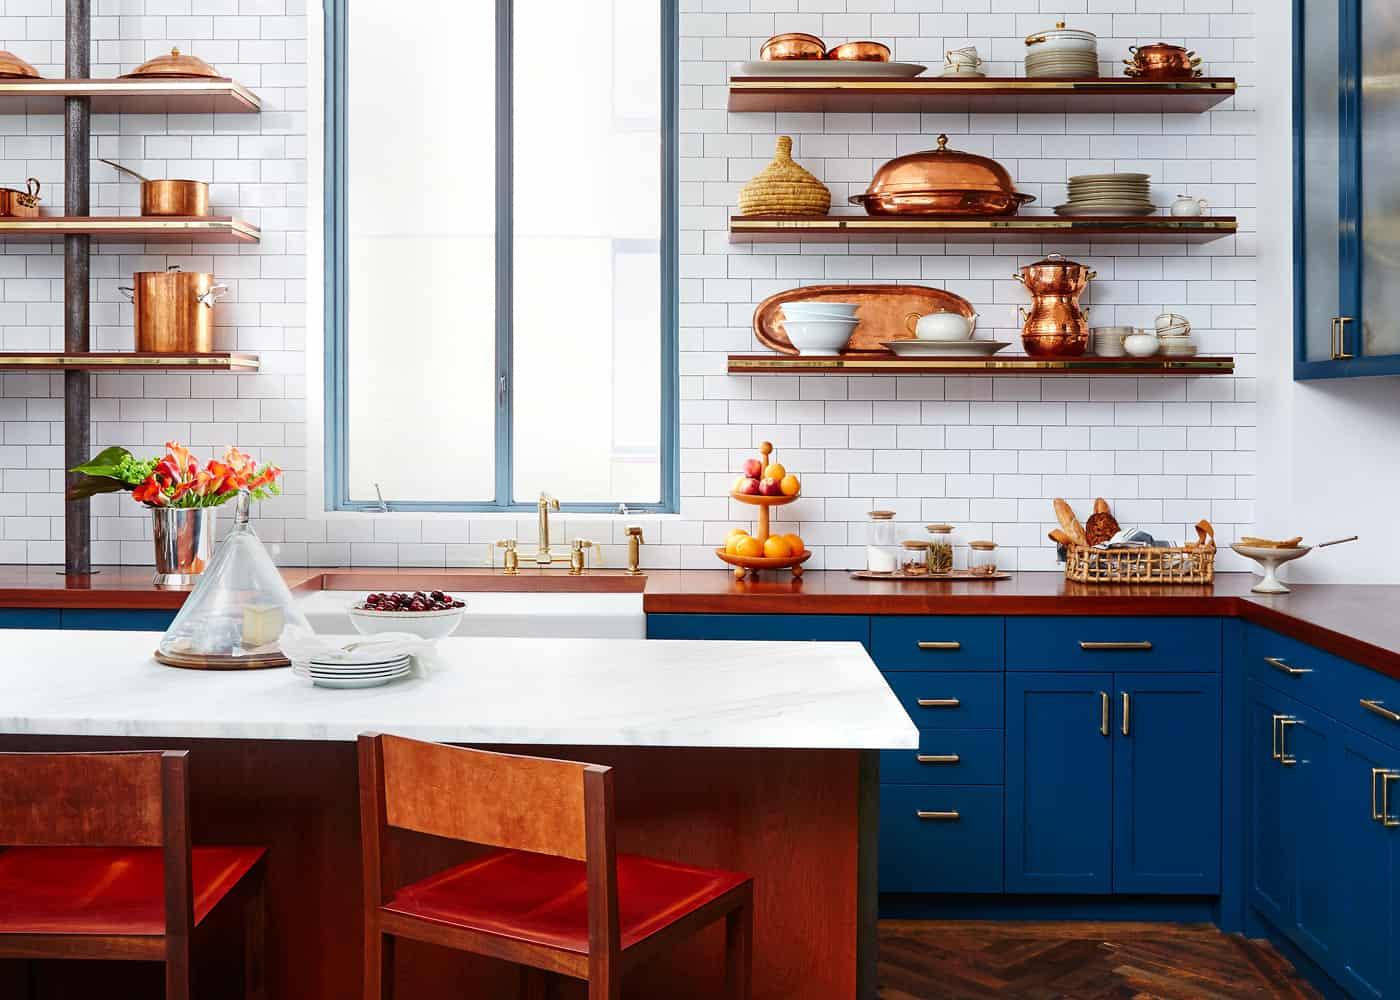 BK-interior-design-navy-blue-cabinets